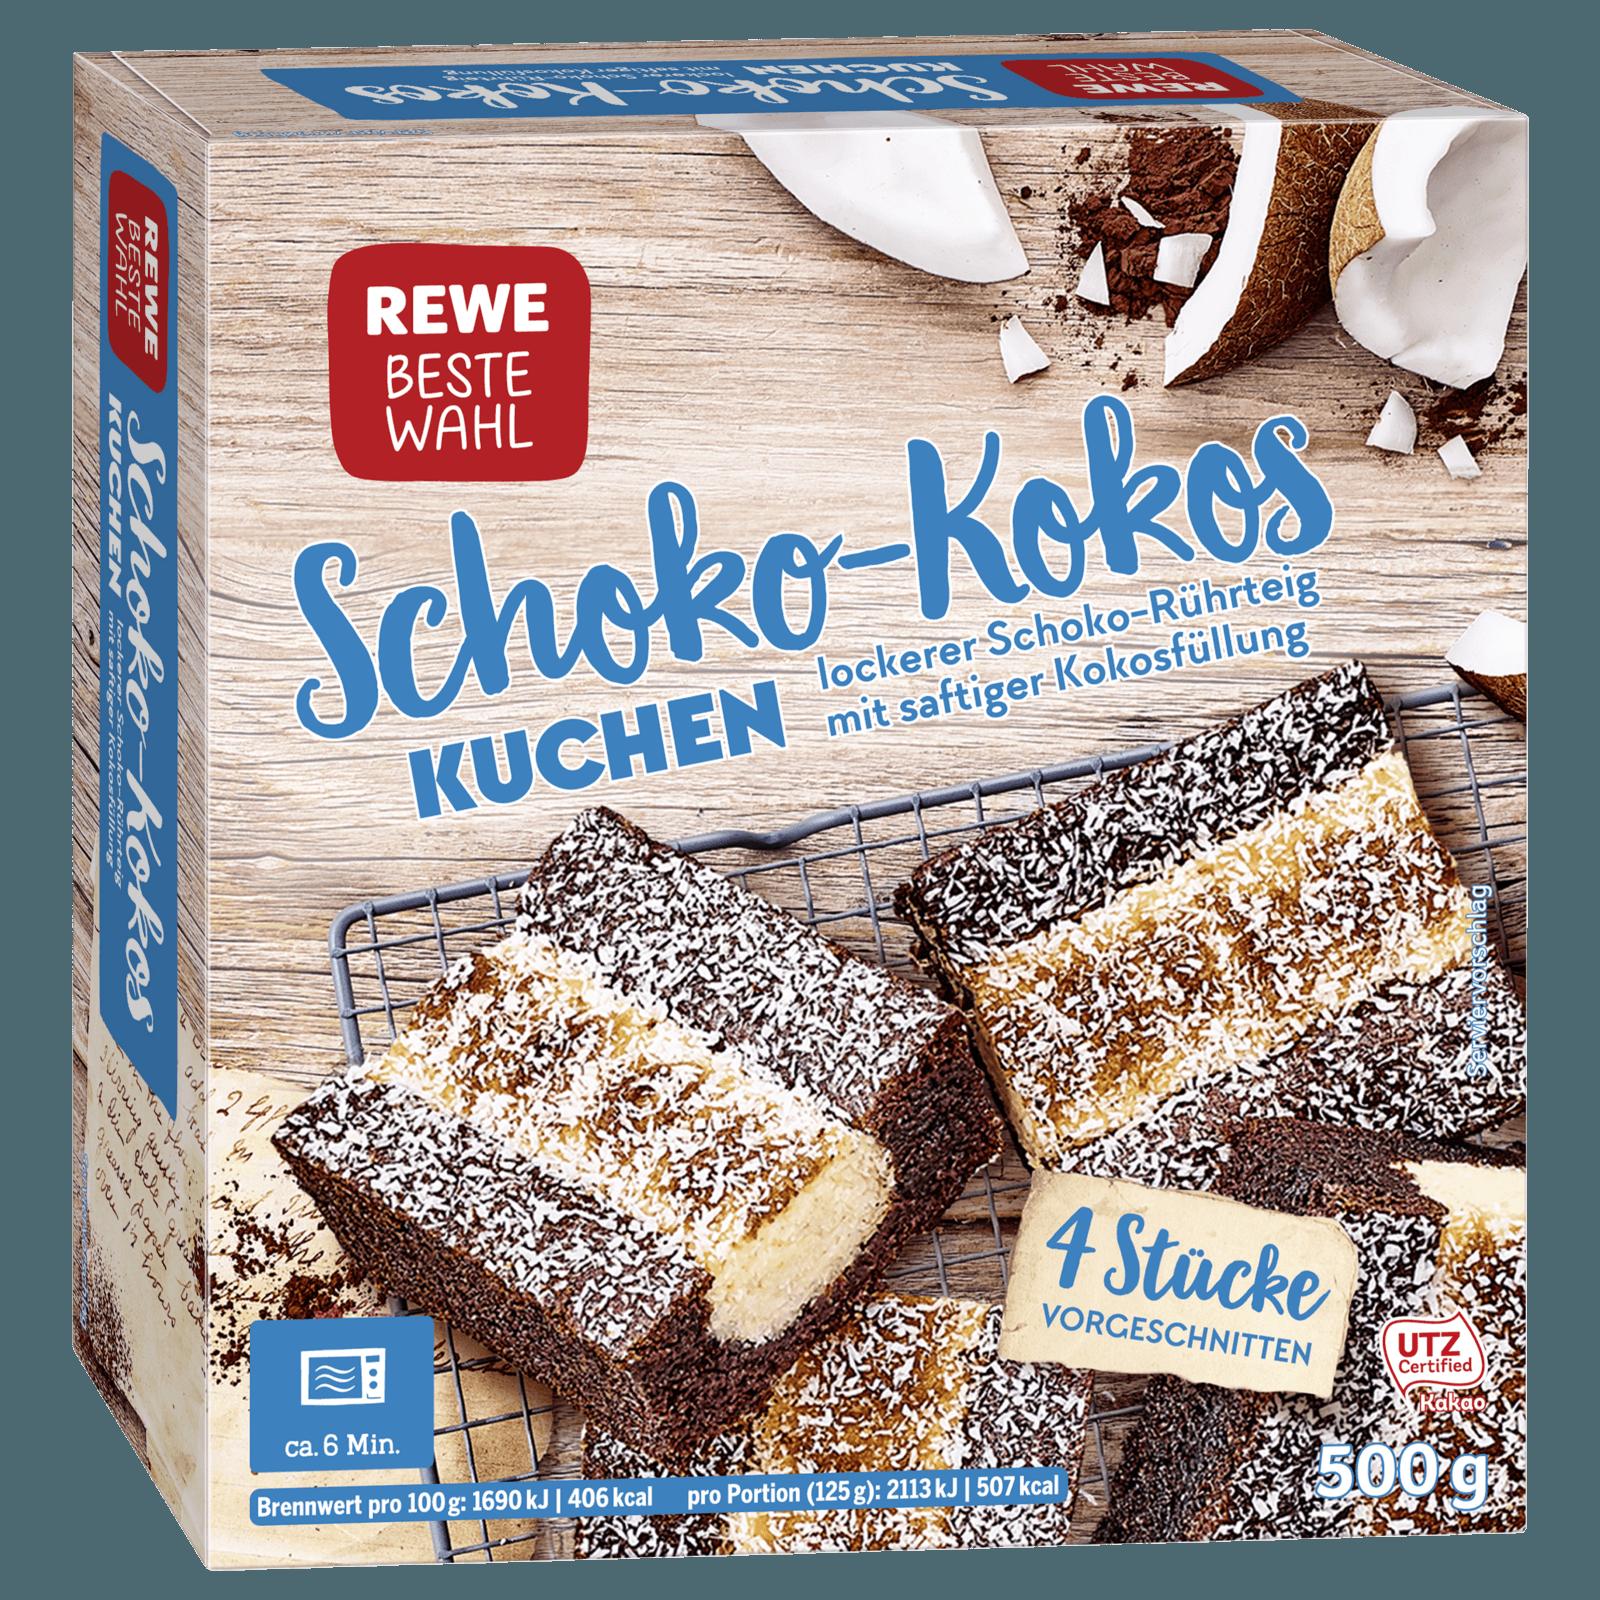 Rewe Beste Wahl Schoko Kokos Kuchen 500g Bei Rewe Online Bestellen